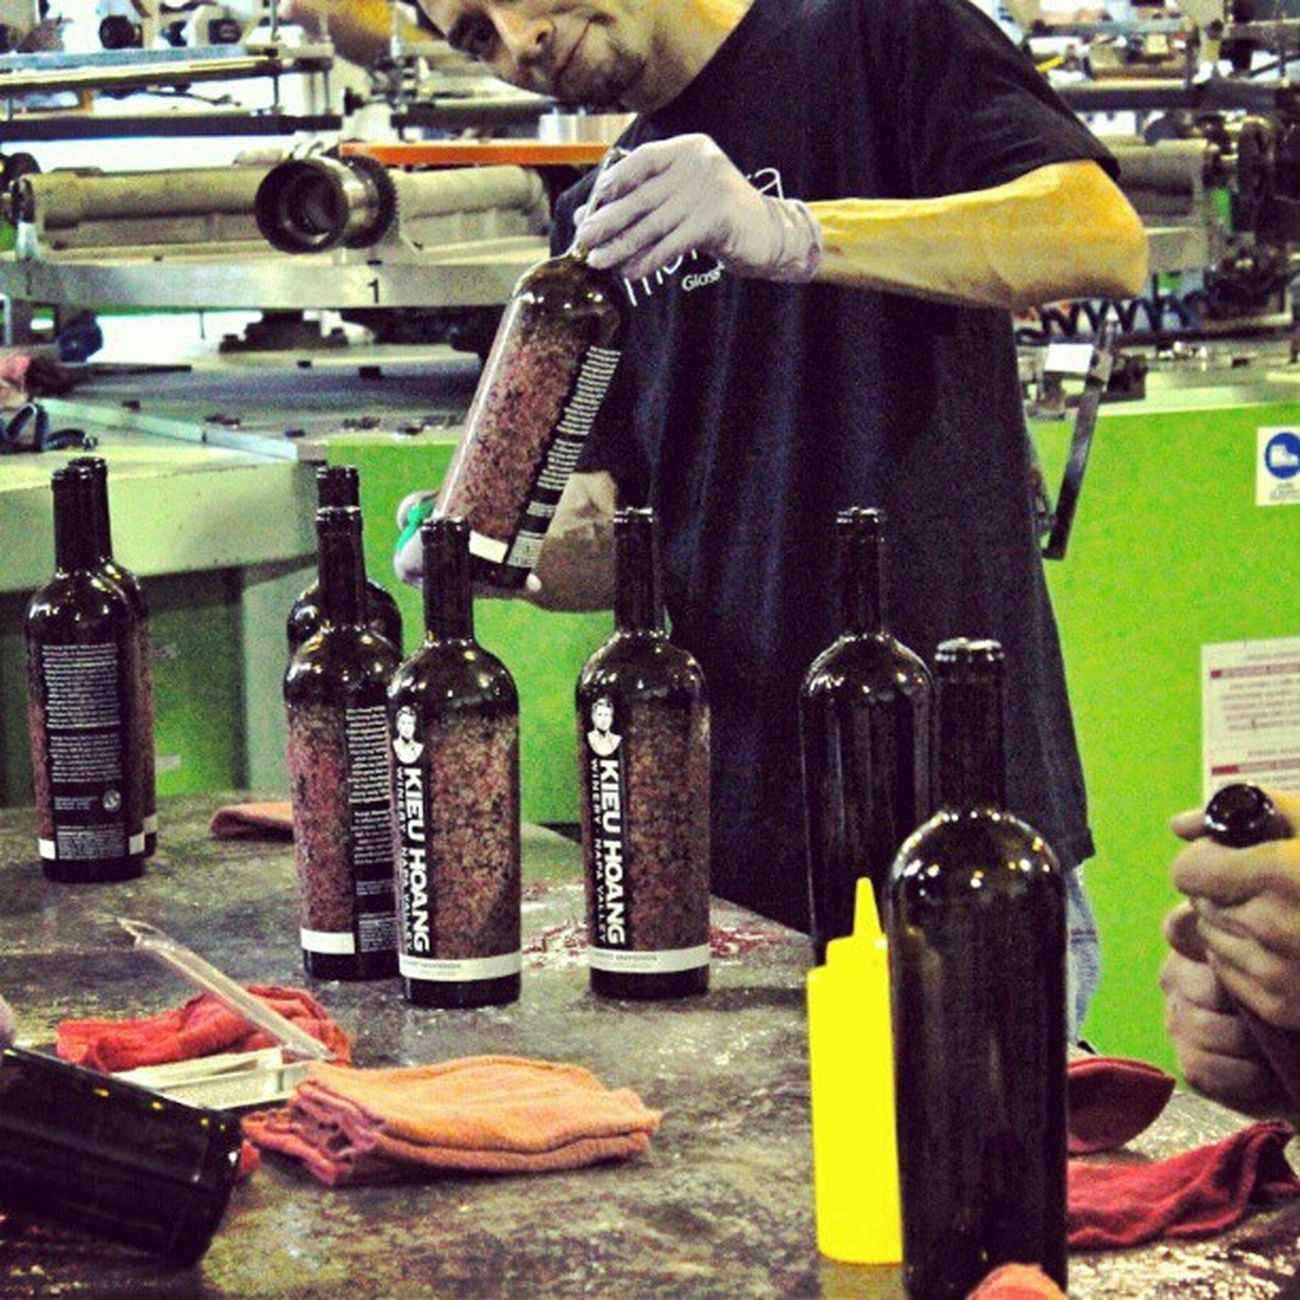 O_o Kieuhoangwine Redcells Redlabel California wine cali nocal napawine